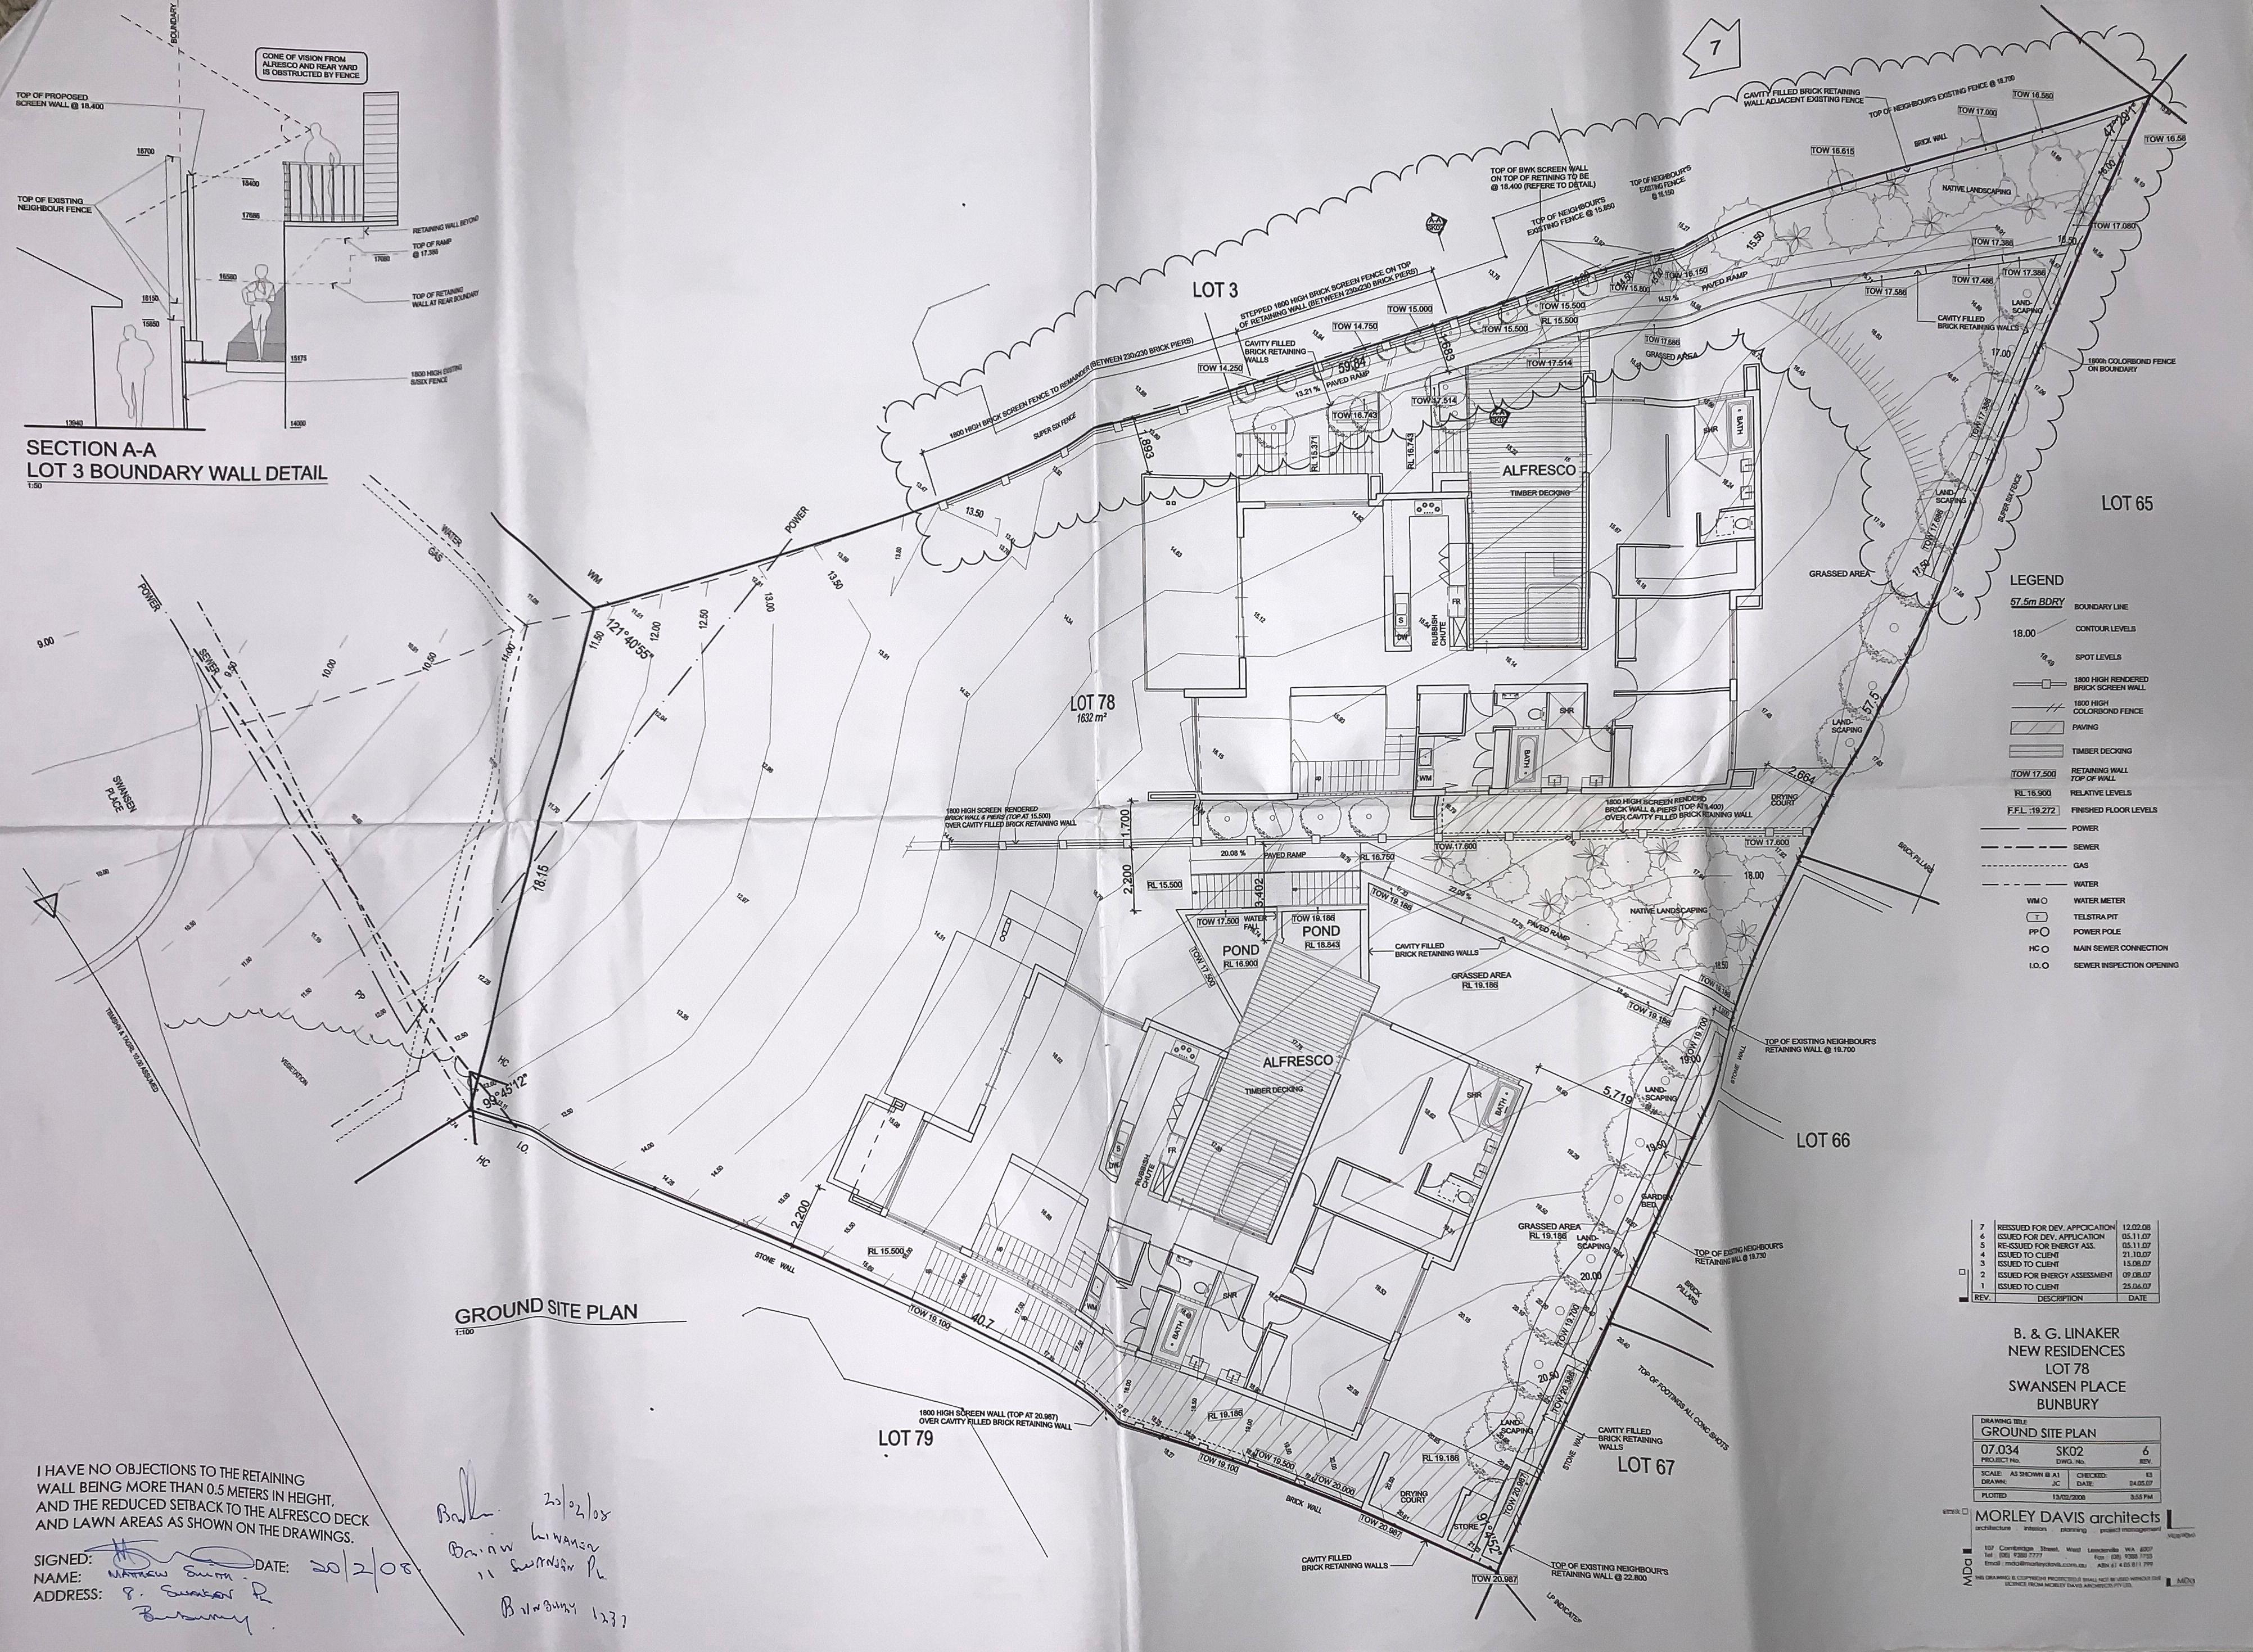 10 Swansen Place, Bunbury